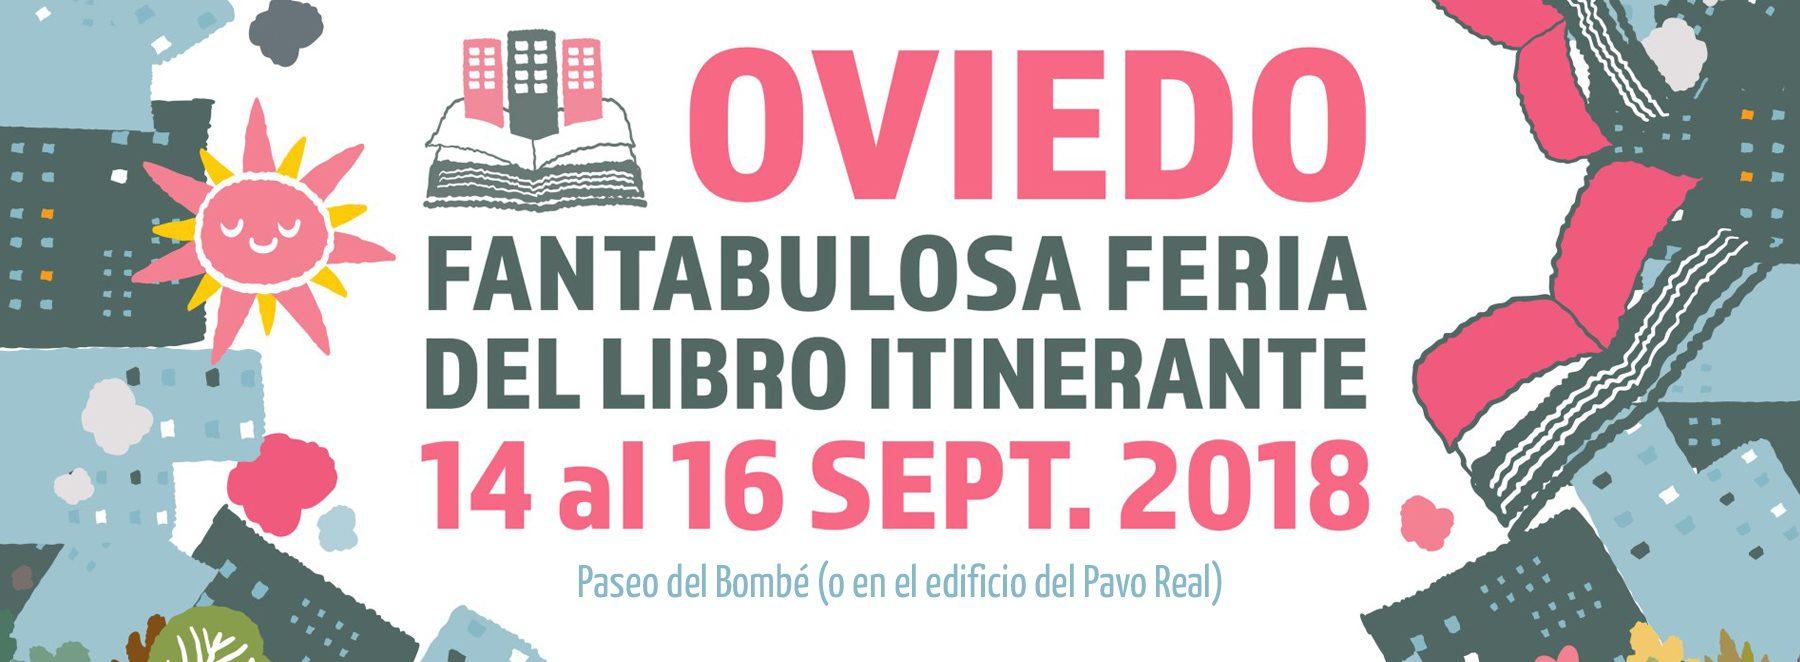 Fantabulosa2018-Oviedo